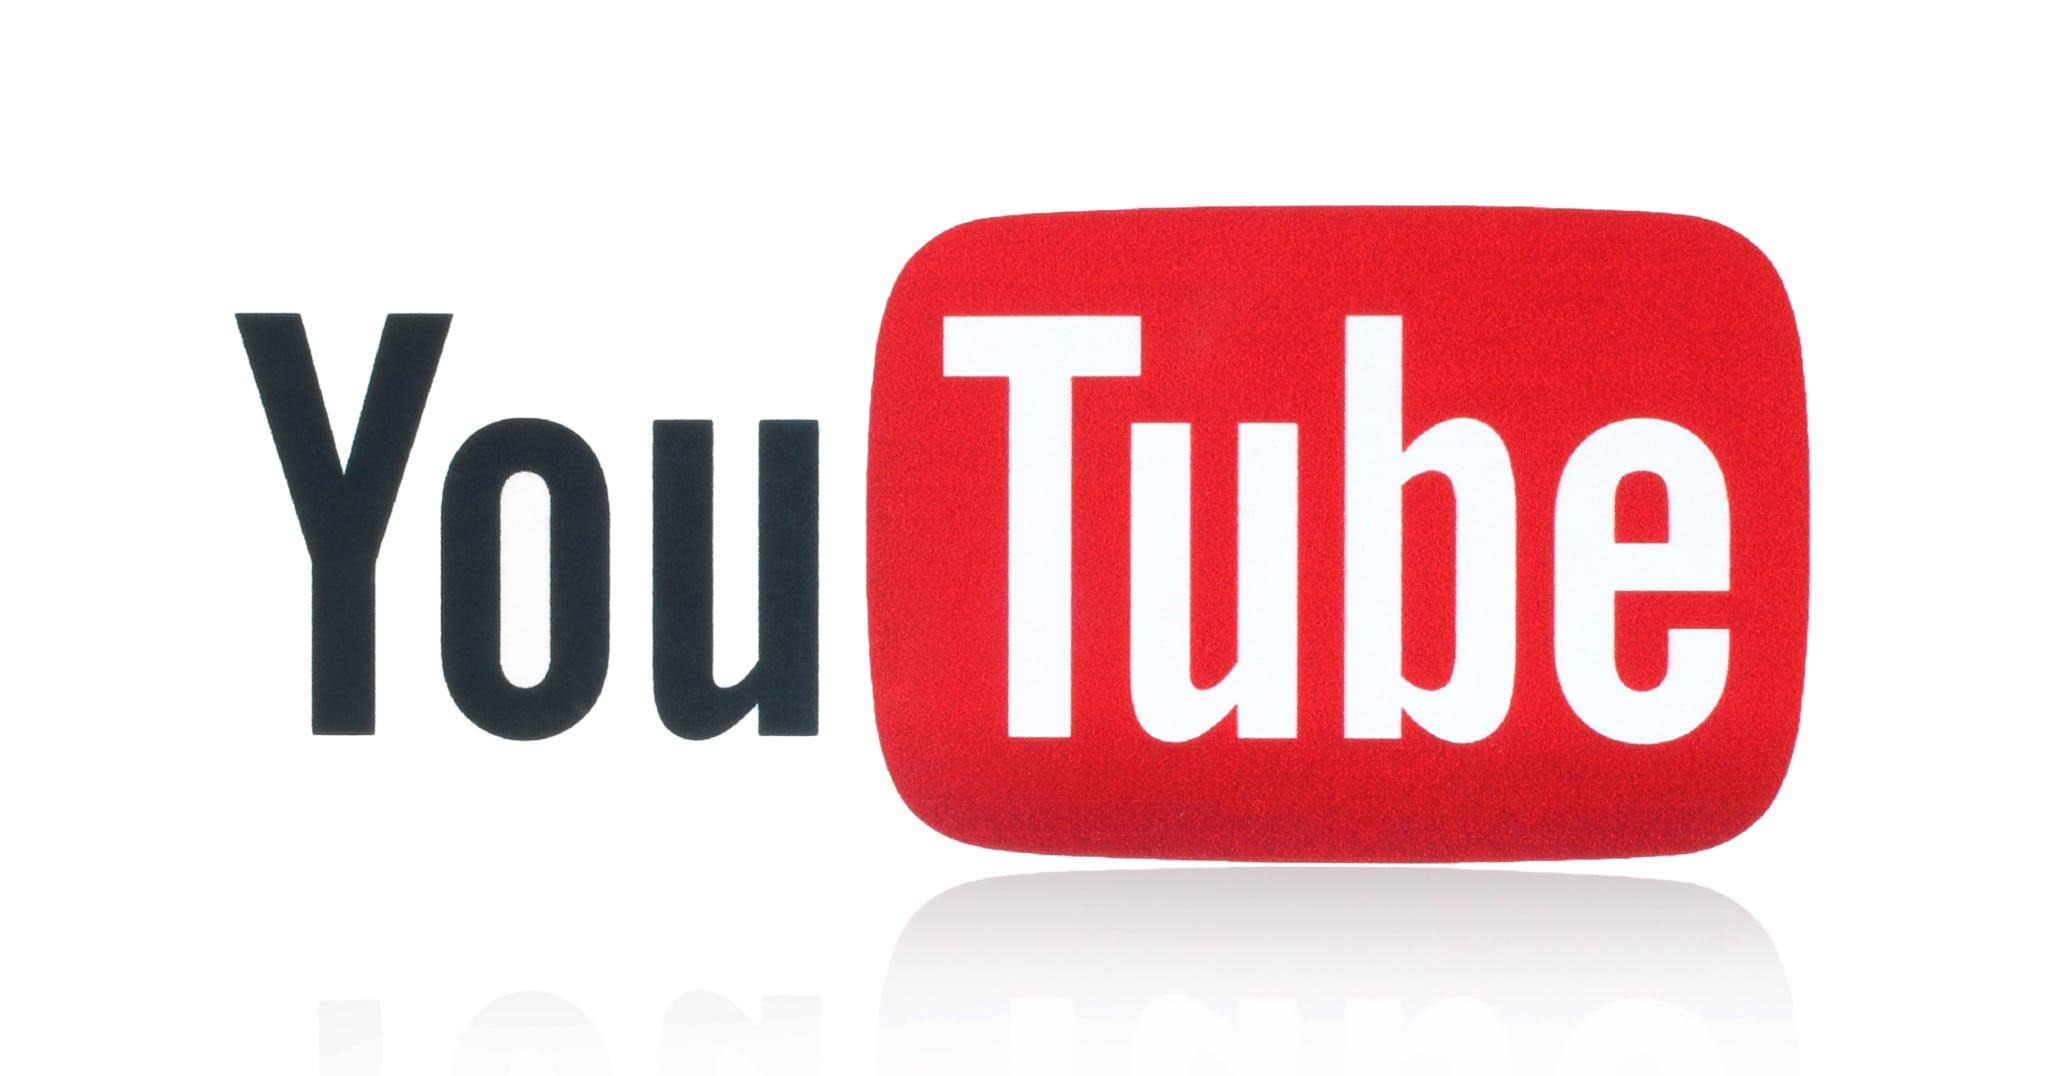 youtube contour cox